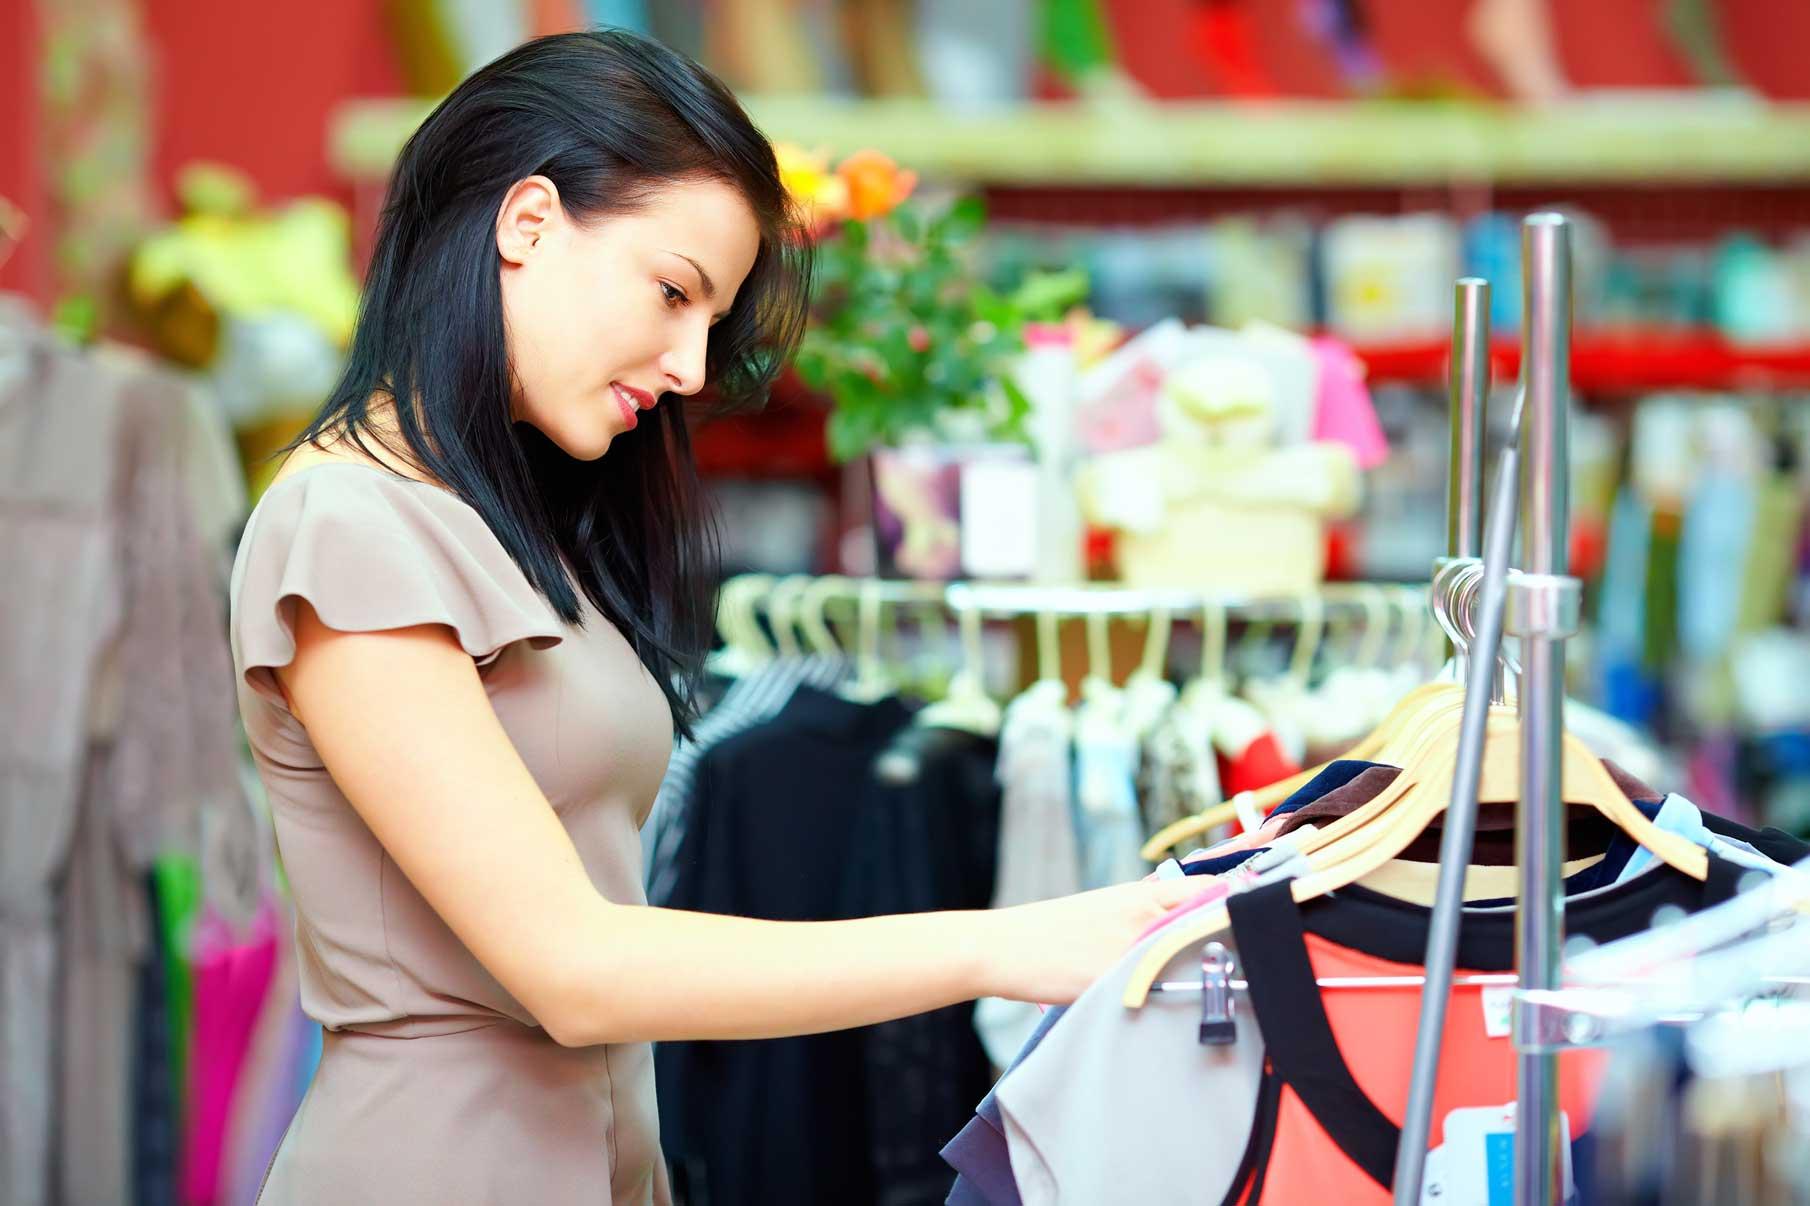 Shopping-Woman-Marketplace-Brunswick-Crossing-New-Home-Frederick-Maryland.jpg